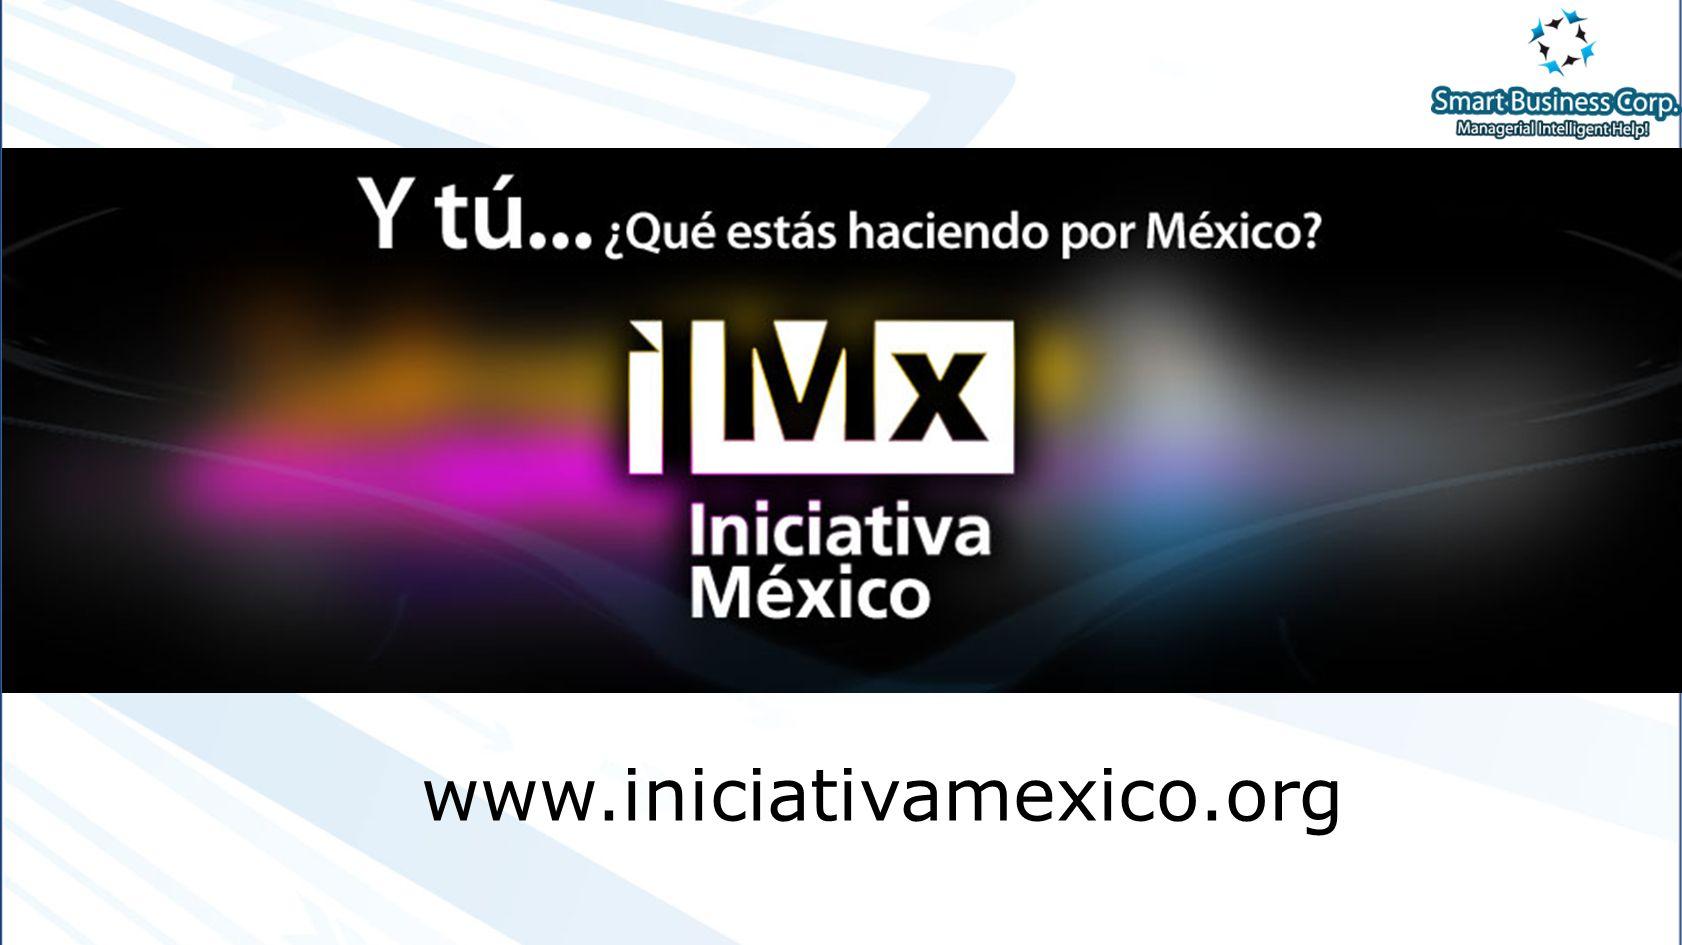 www.iniciativamexico.org